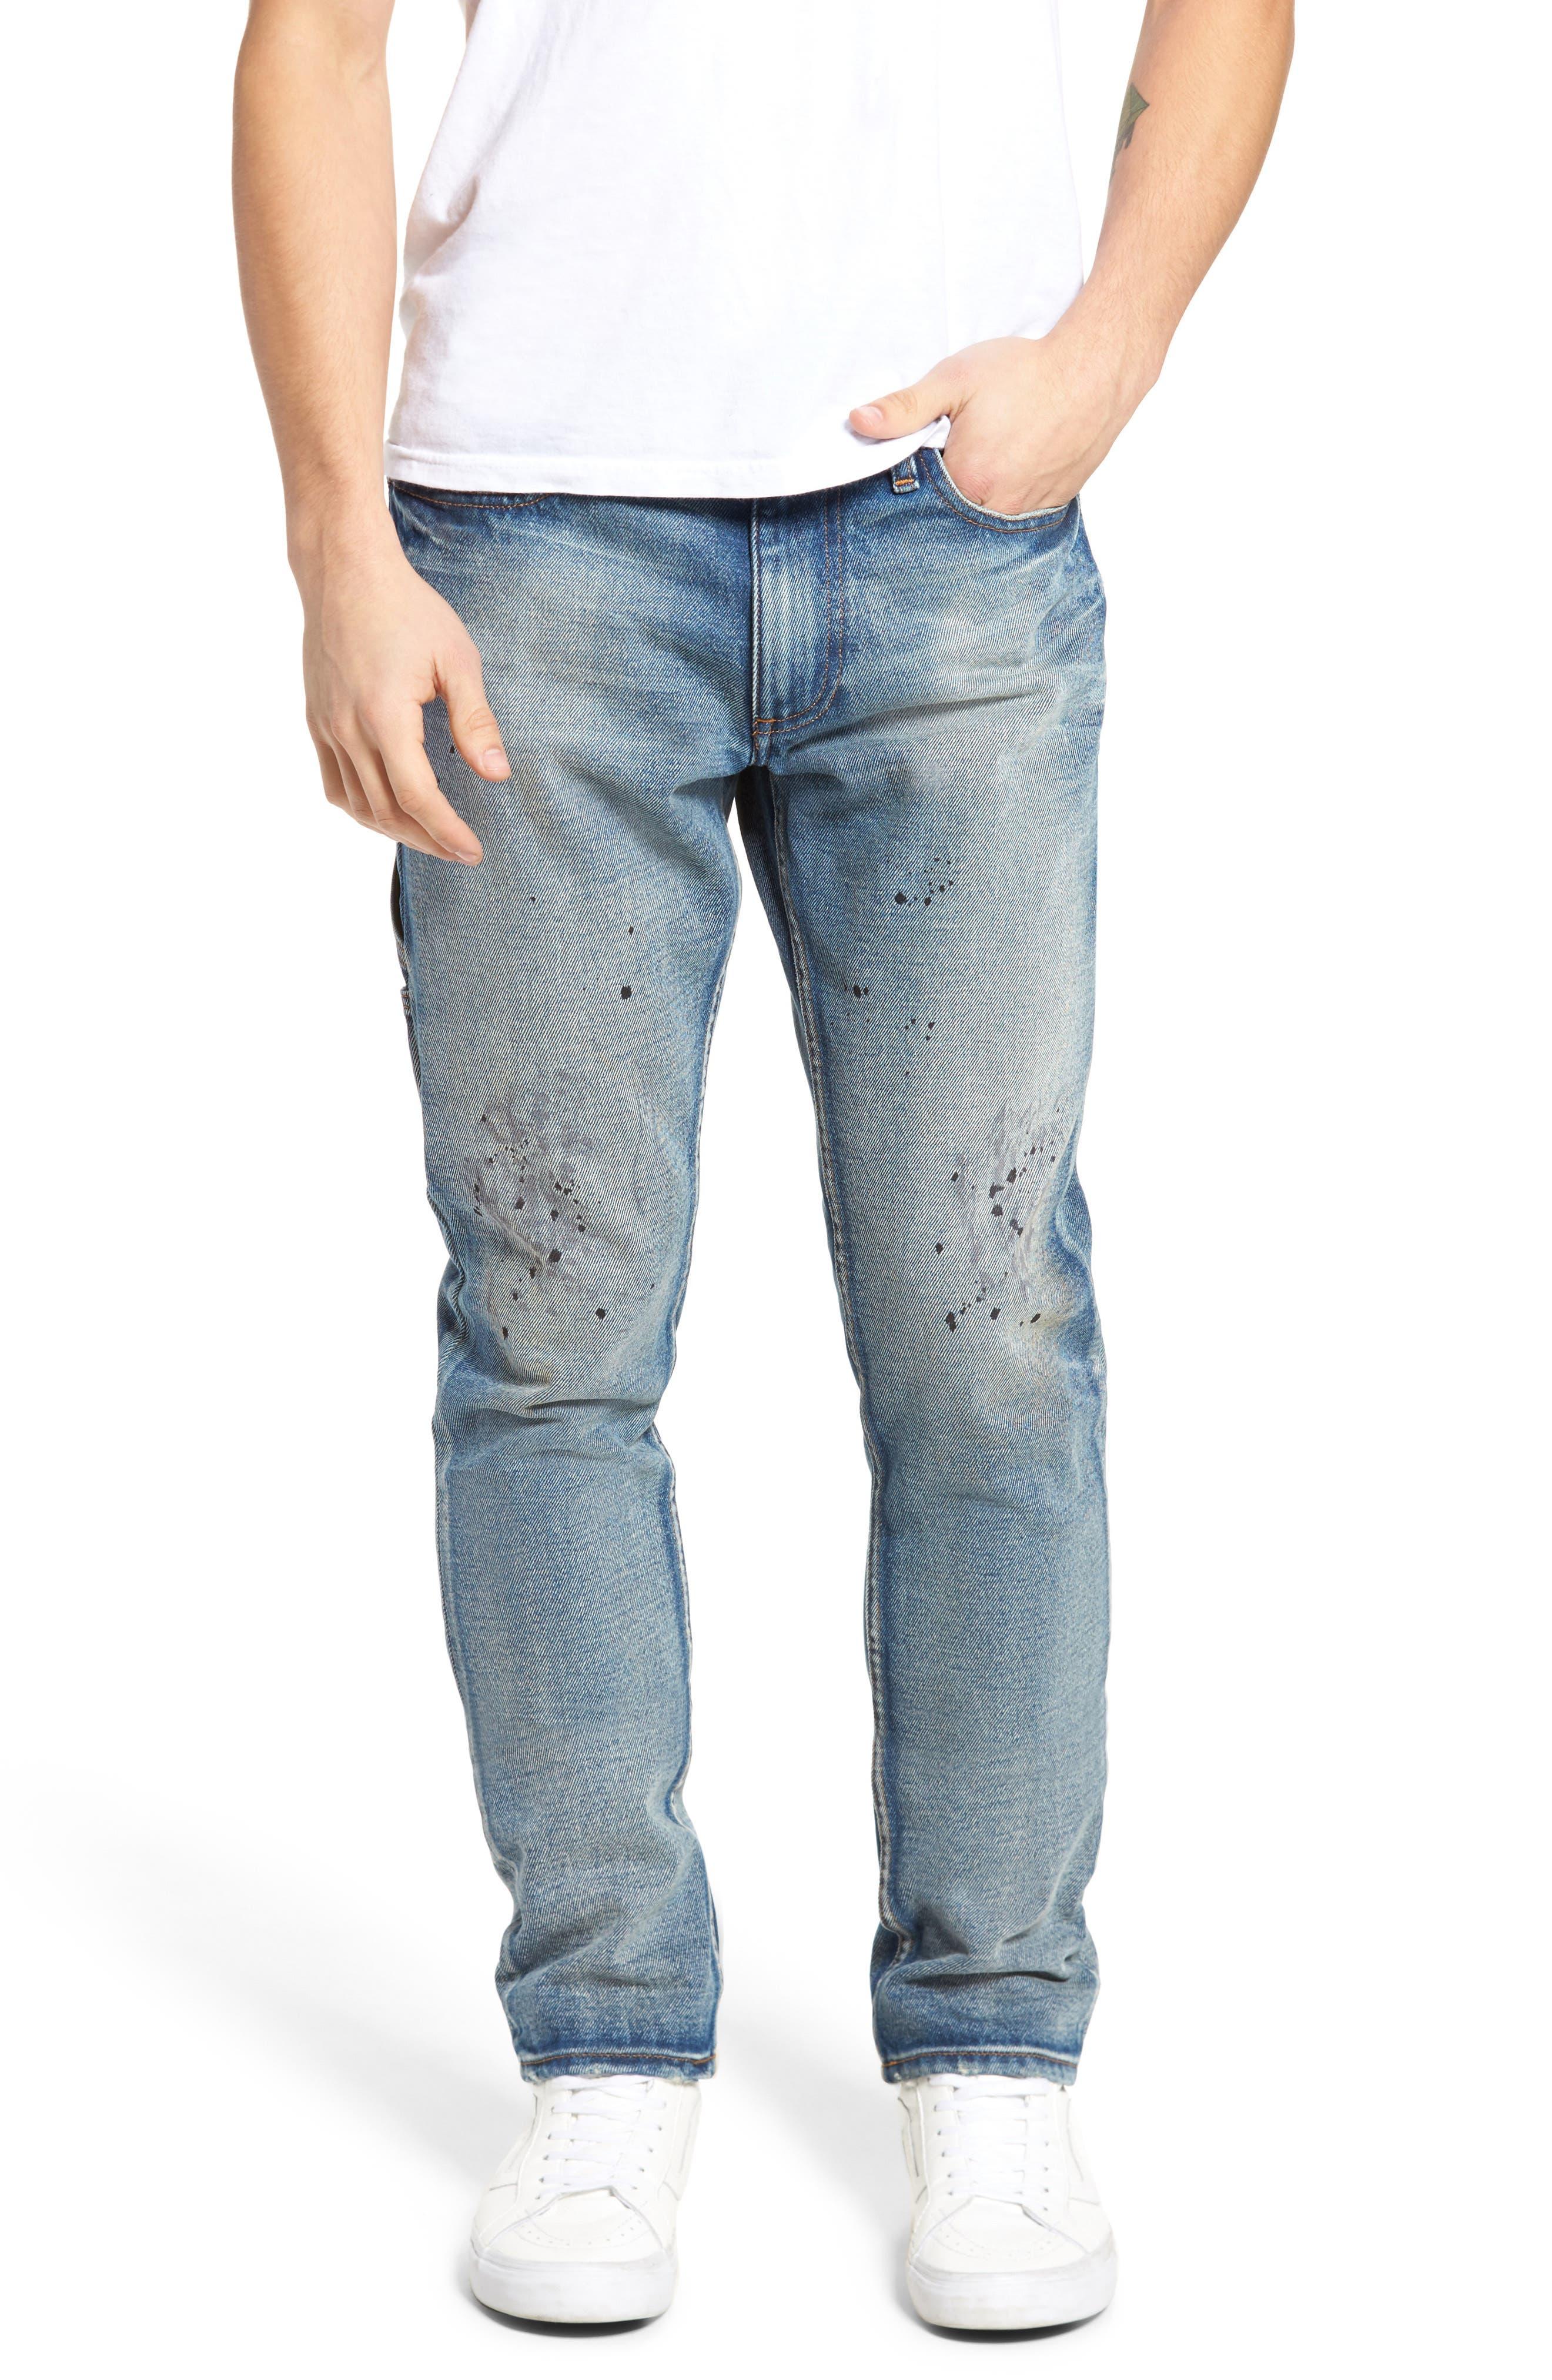 Alternate Image 1 Selected - Calvin Klein Jeans Carpenter Slim Fit Jeans (Garage Paint)